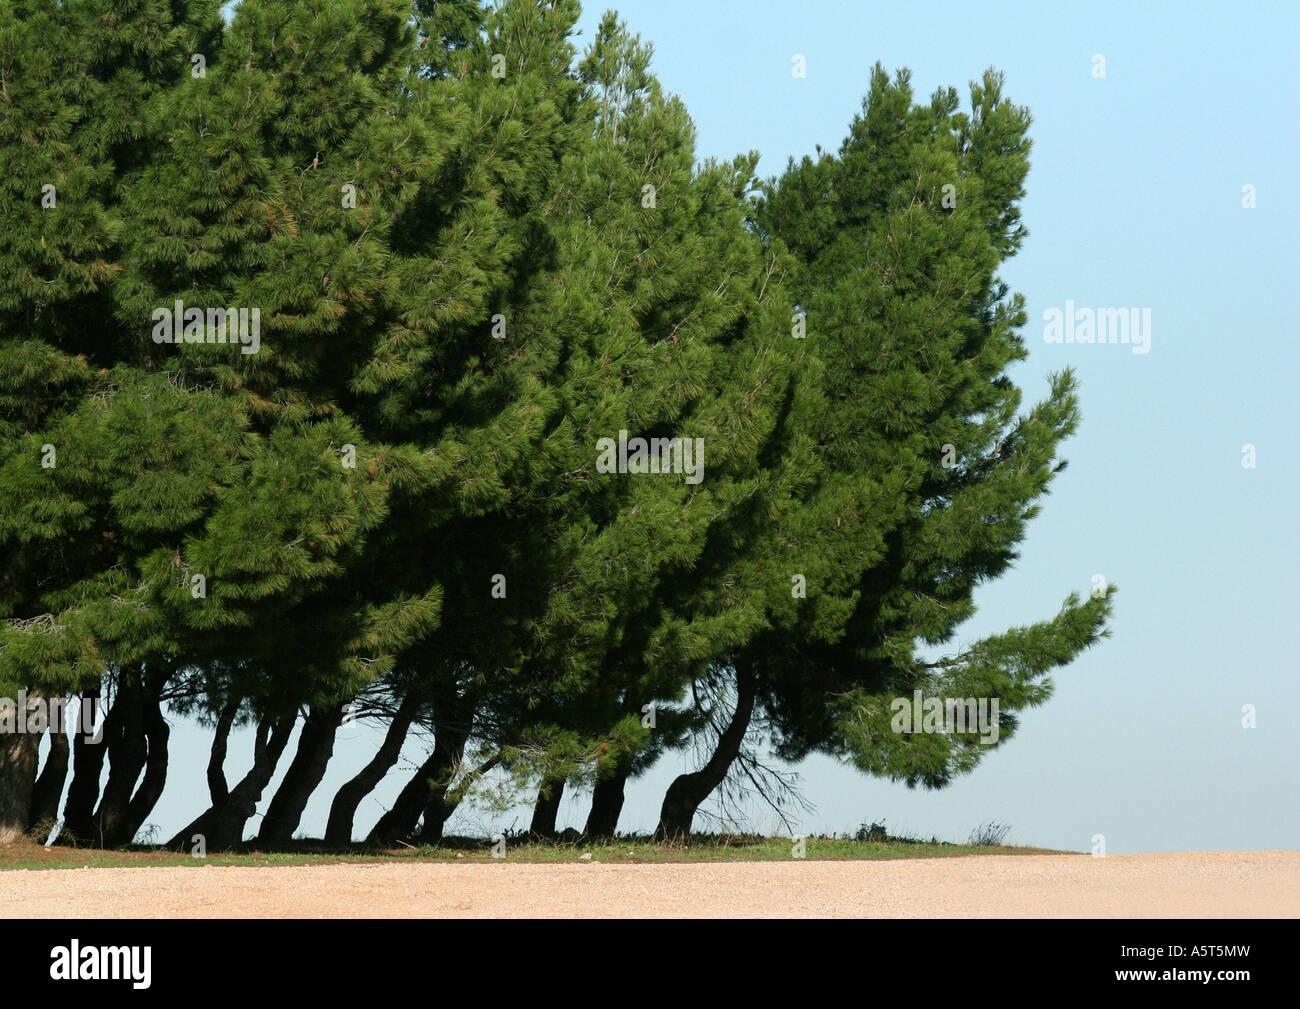 Evergreens - Stock Image